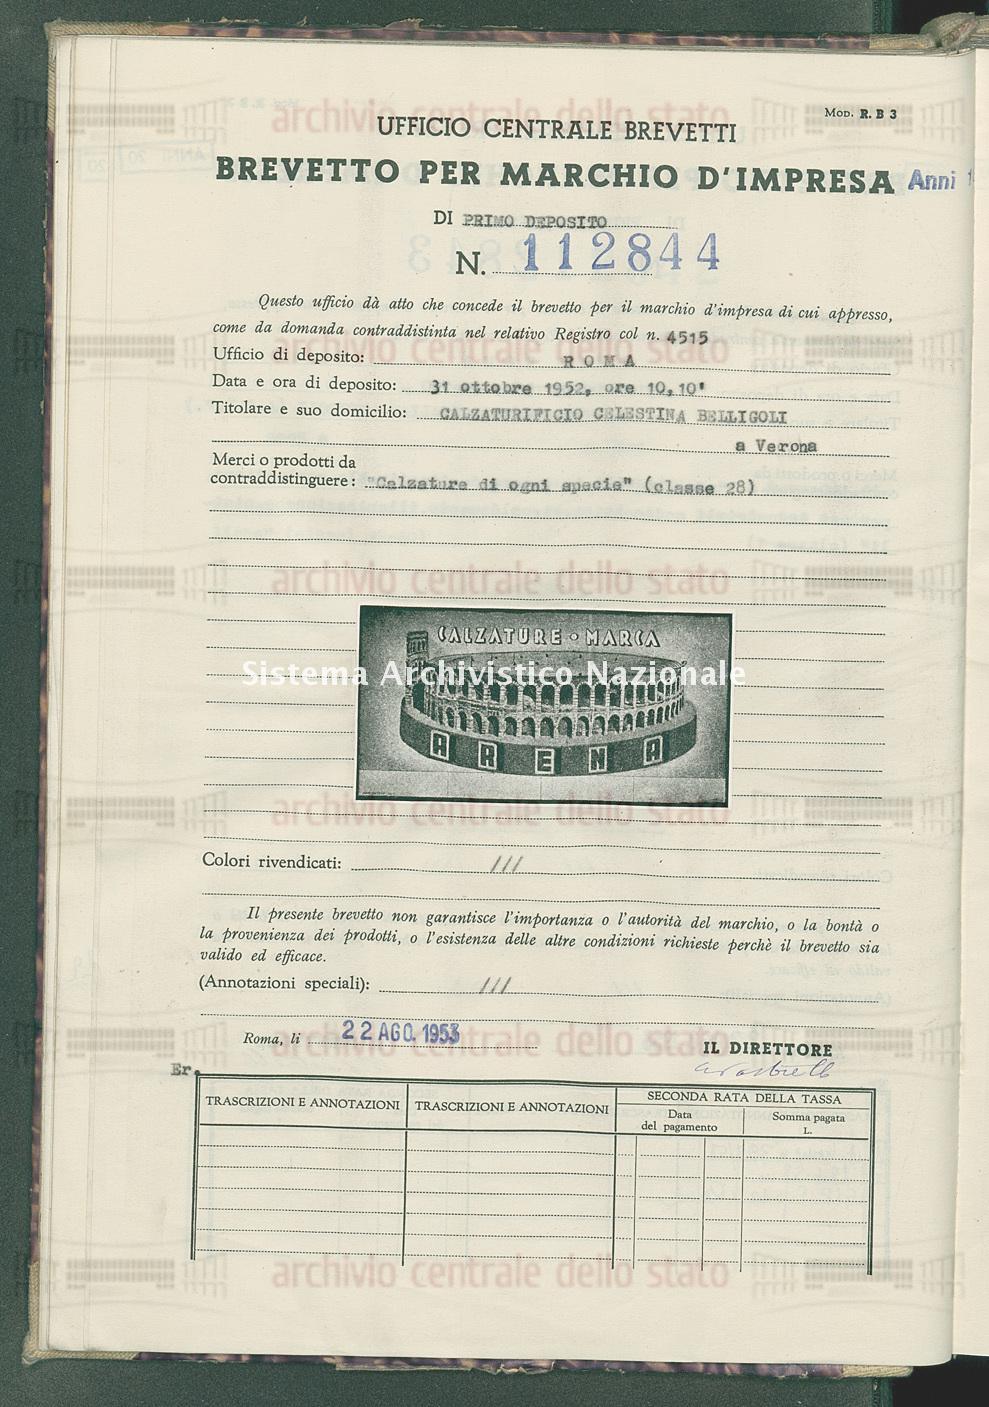 'Calzature di ogni specie' Calzaturificio Celestina Belligoli (22/08/1953)